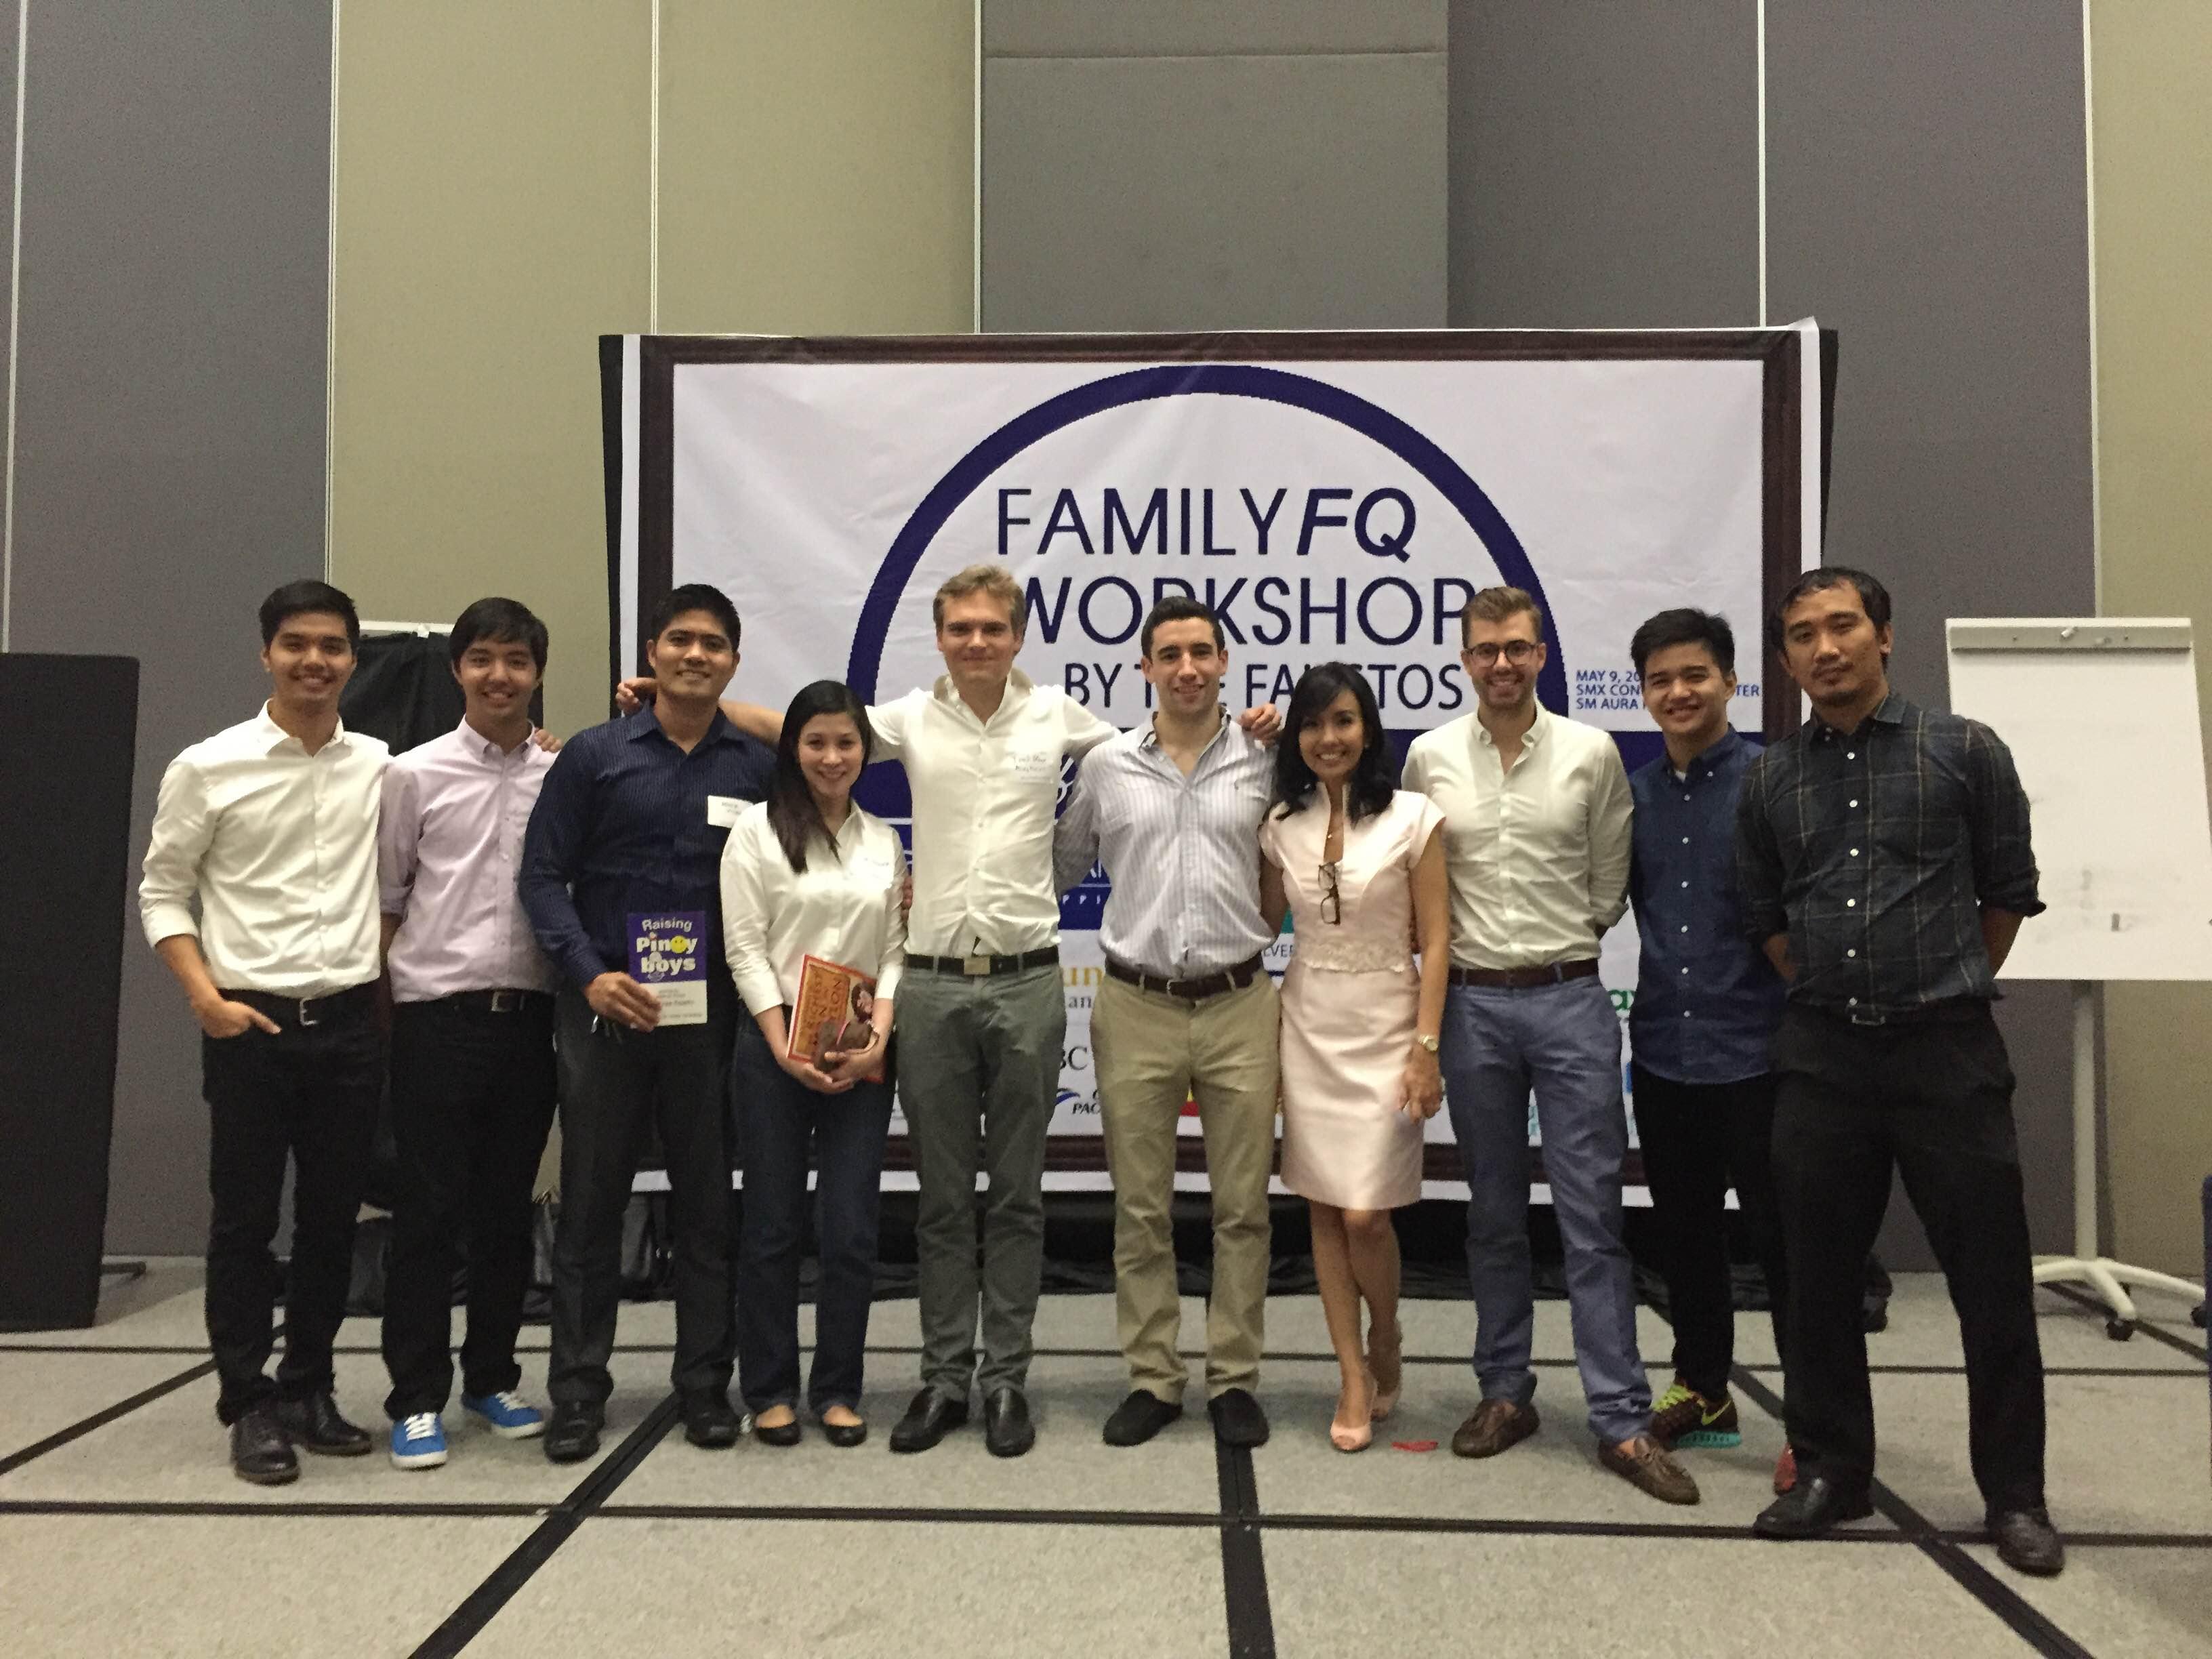 Family FQ Workshop